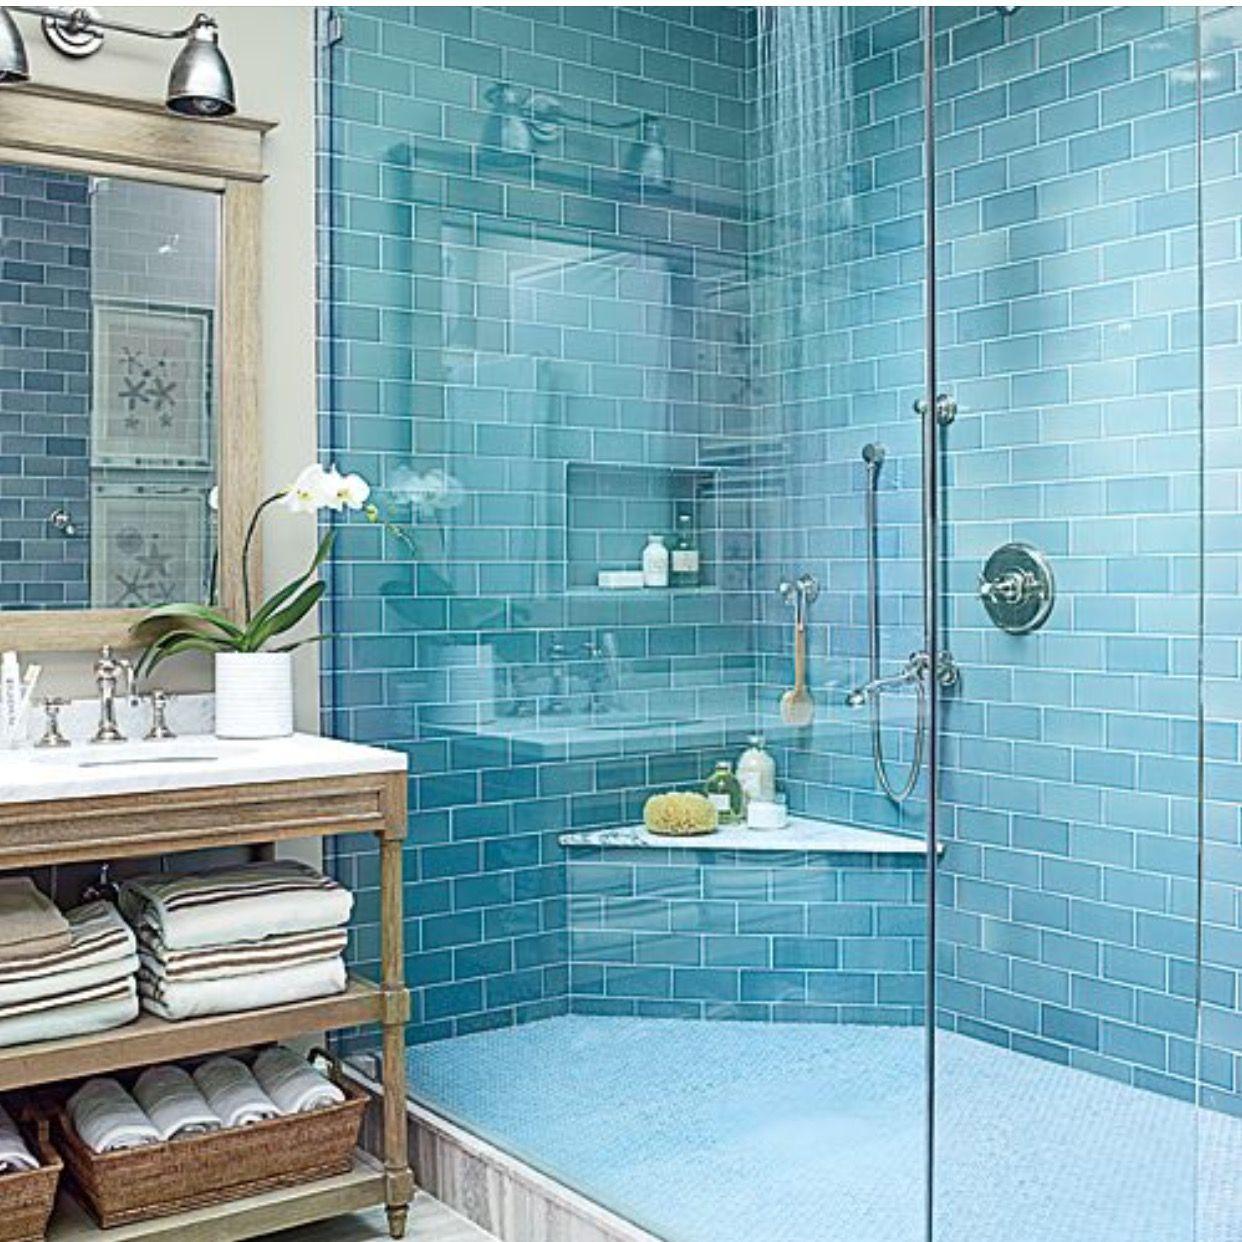 Pin by Andrea Kane on Decor | Pinterest | Blue bath, Coastal and Bath